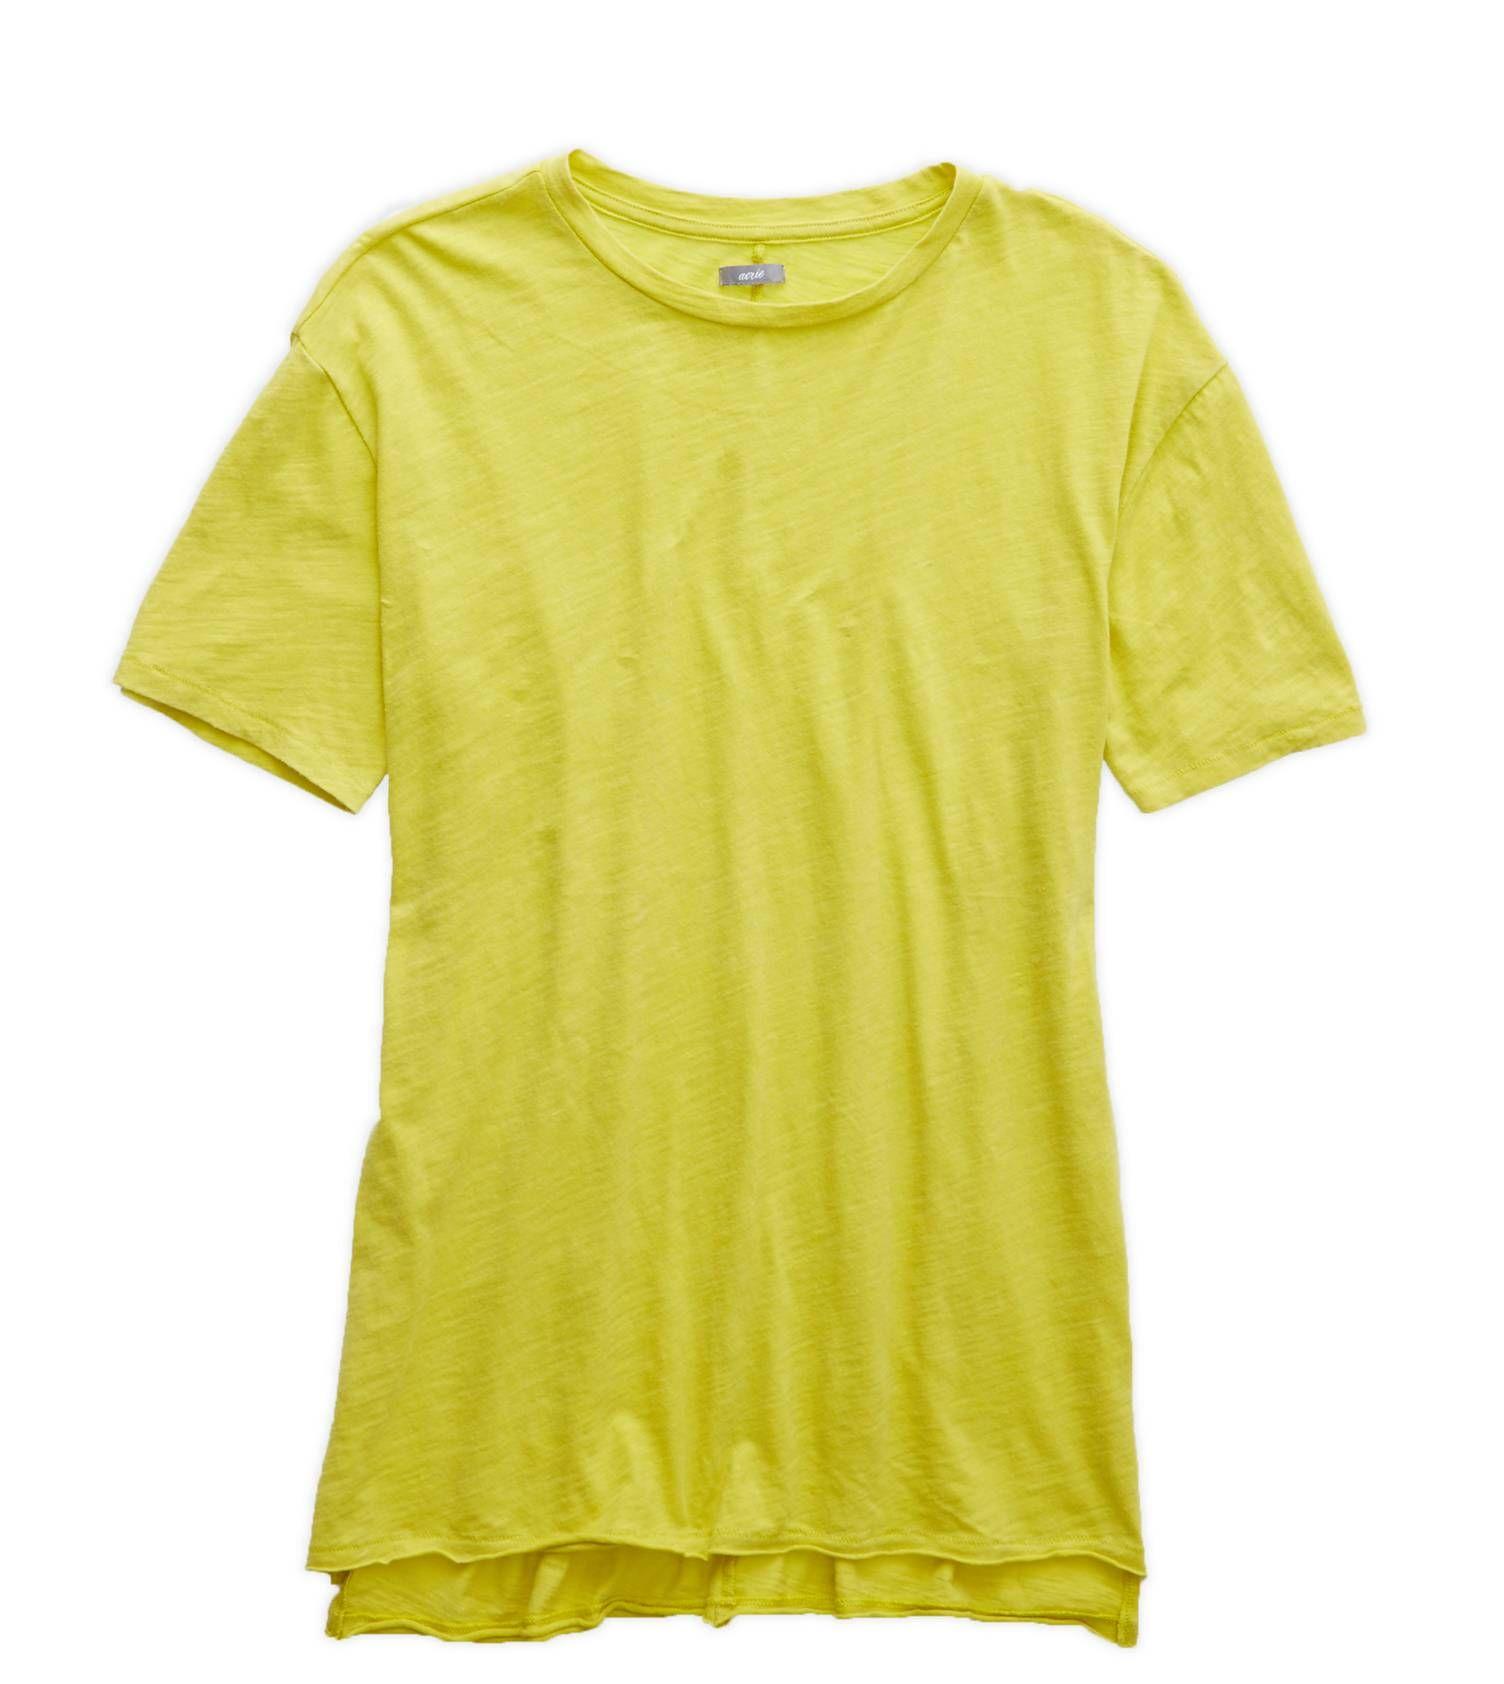 Aerie Boyfriend T-Shirt - But it's better than your boyfriend's! #Aerie